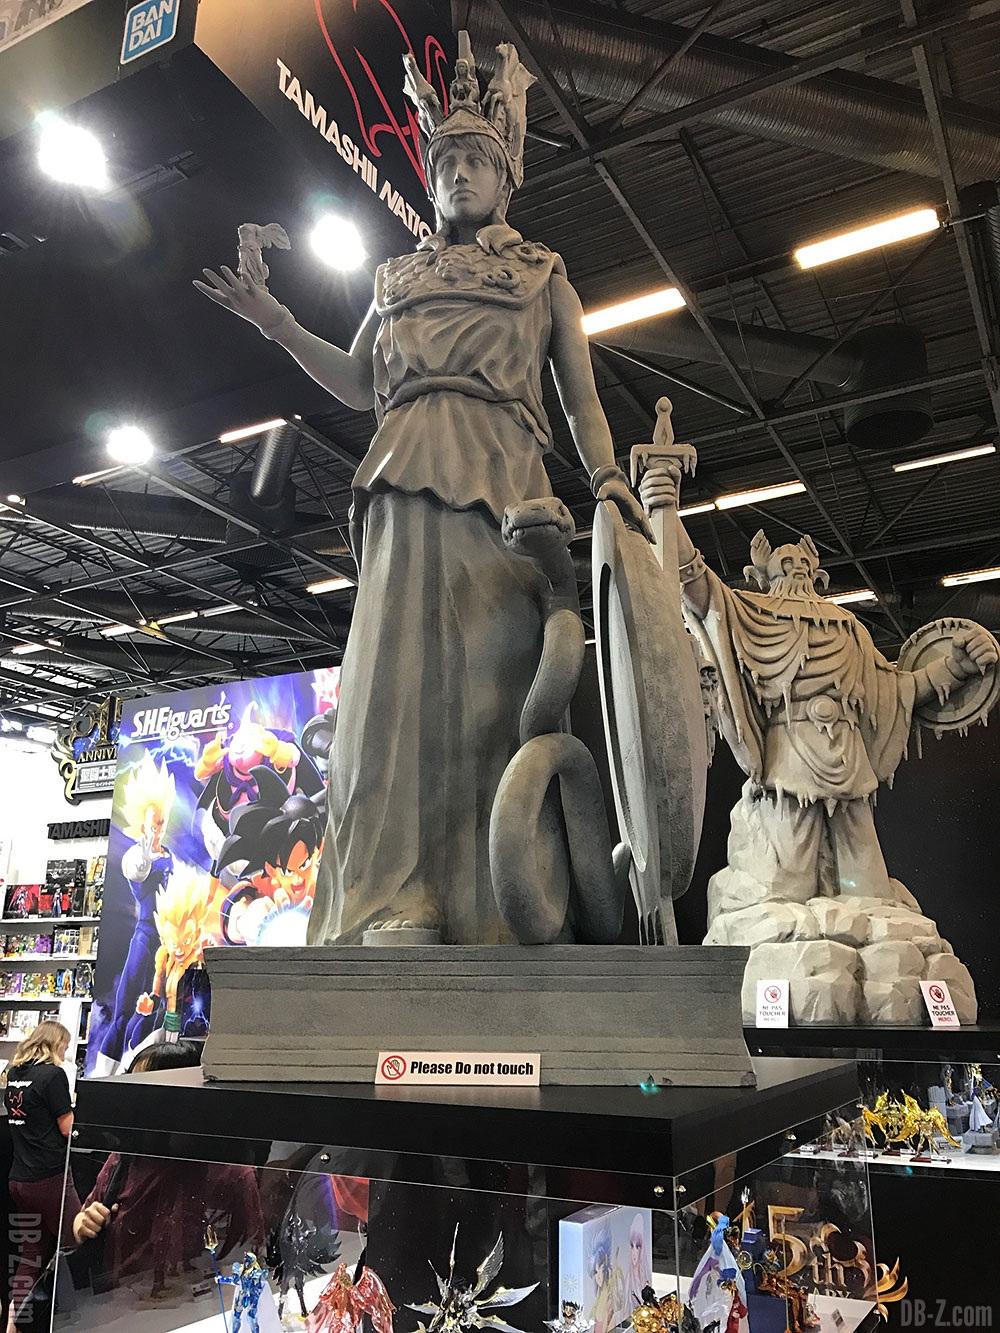 Japan Expo Les Stands : Le stand tamashii nations à la japan expo 2018